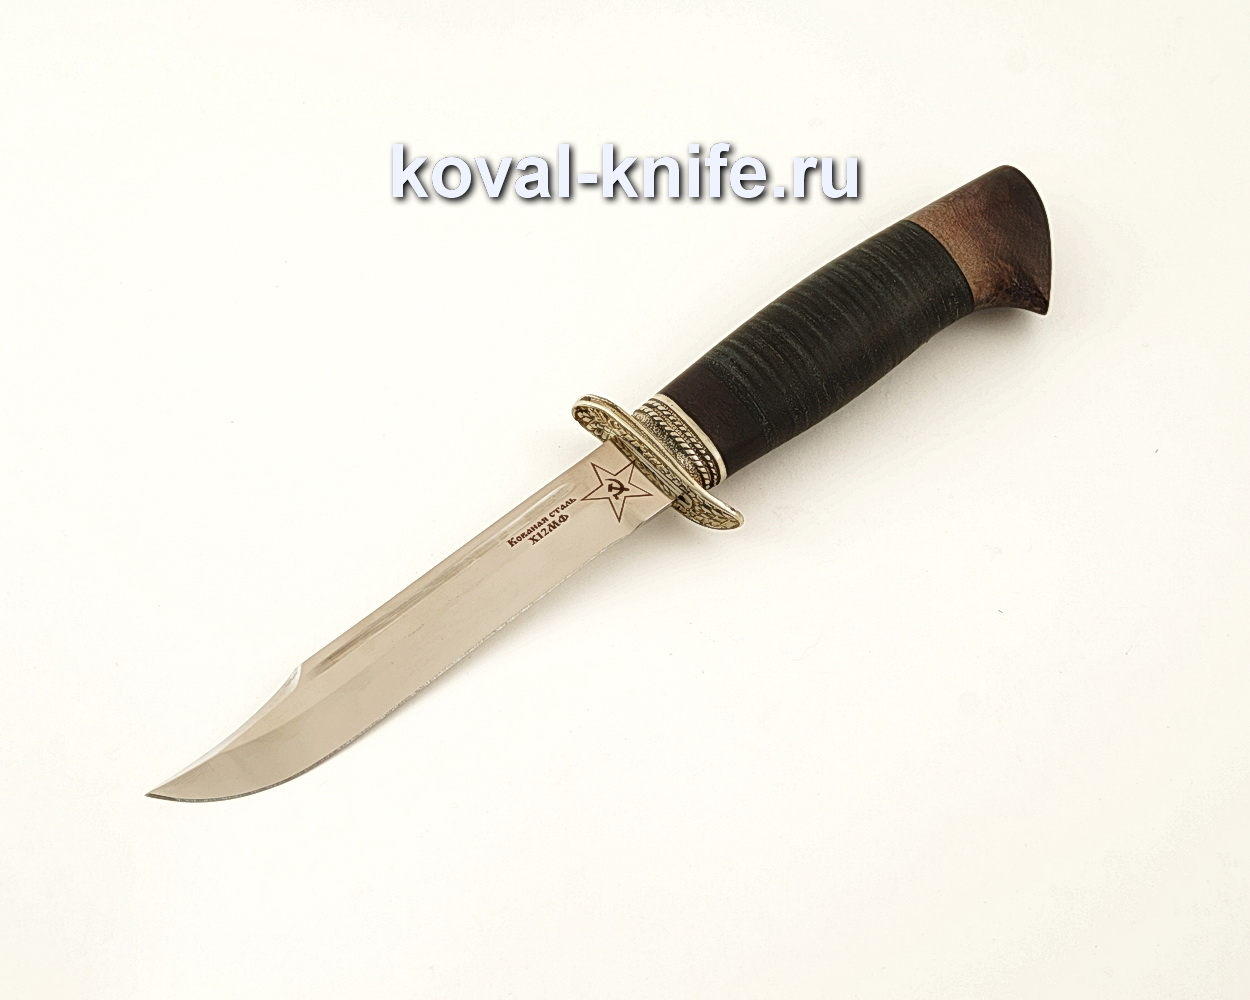 Нож Штрафбат — реплика ножа НР40 из кованой стали Х12МФ с рукоятью из кожи  A623